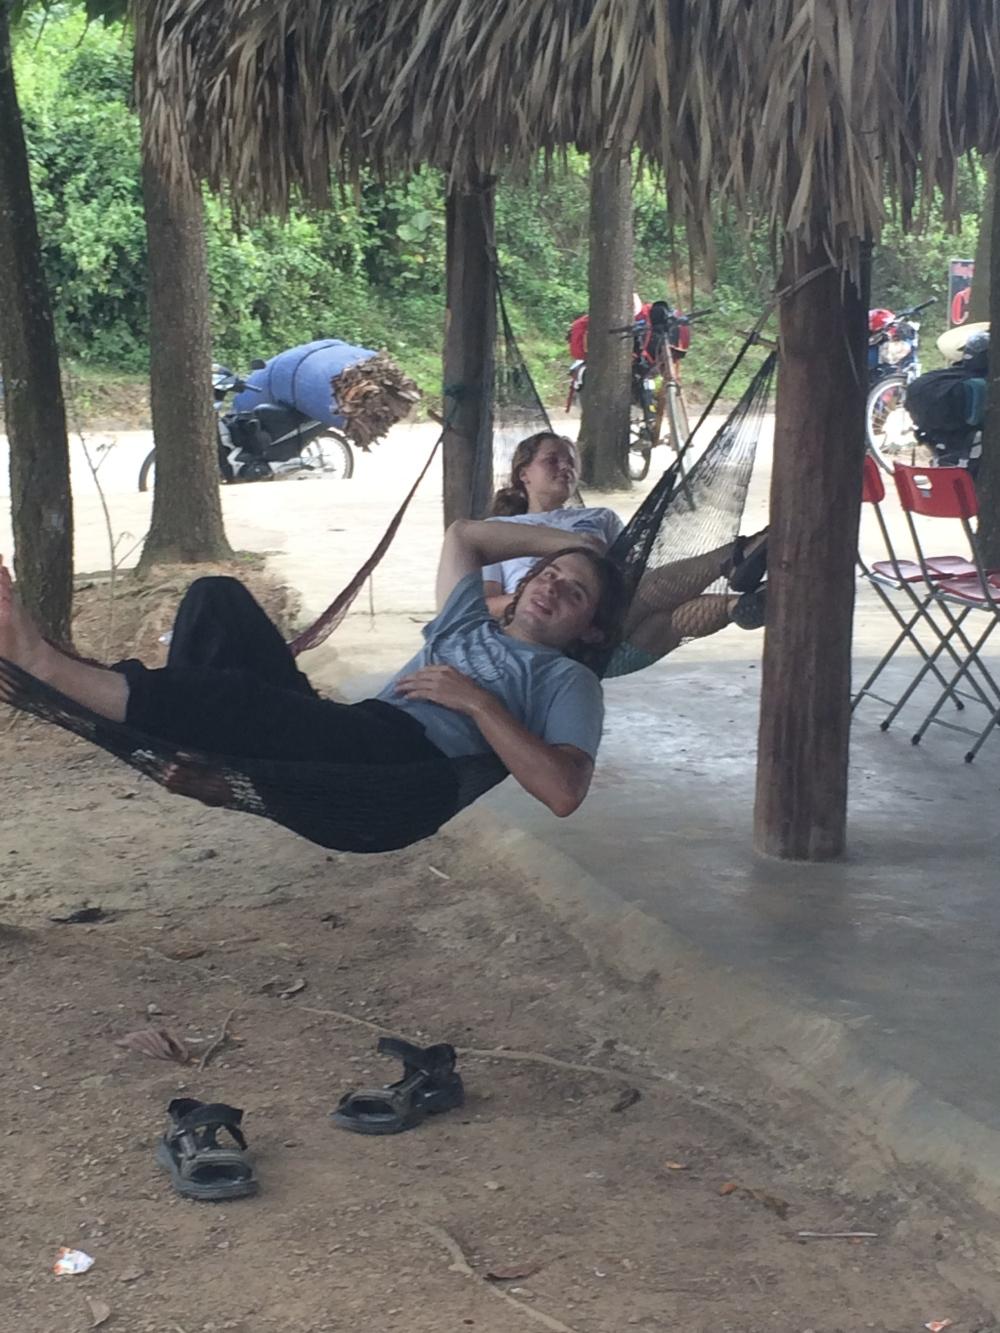 Vietnamese style siesta